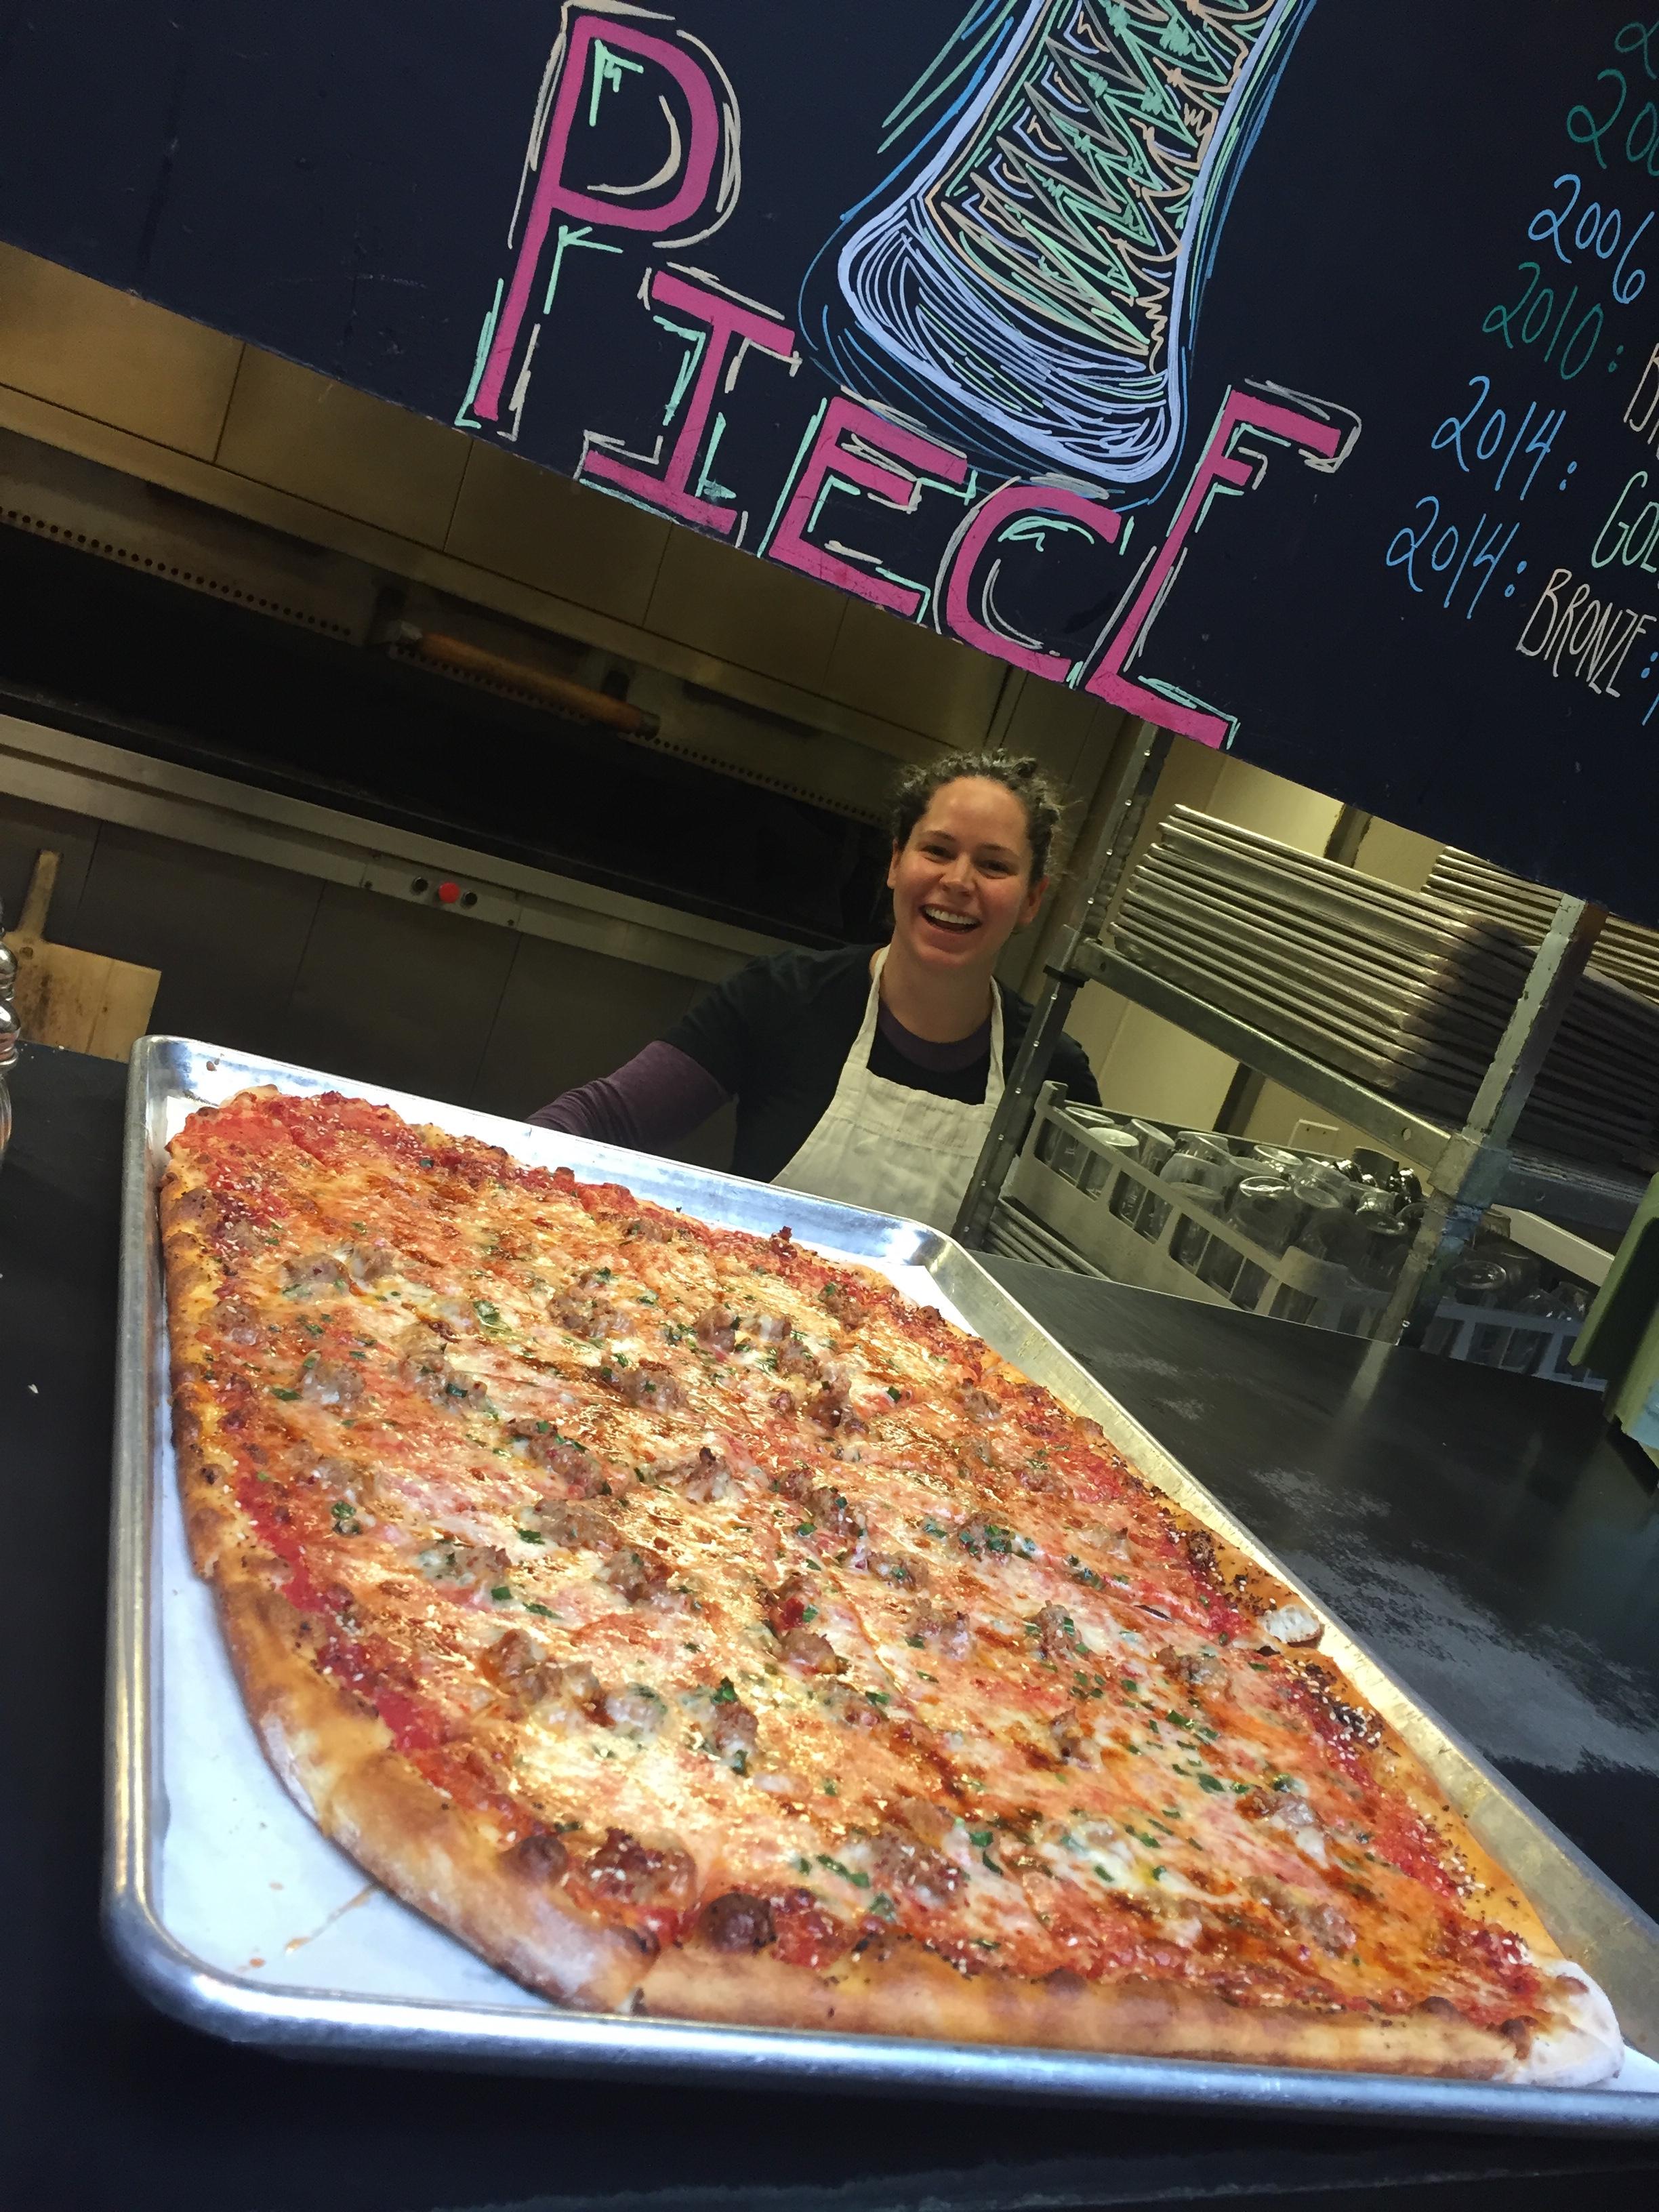 Steph Izard/Piece Pizza